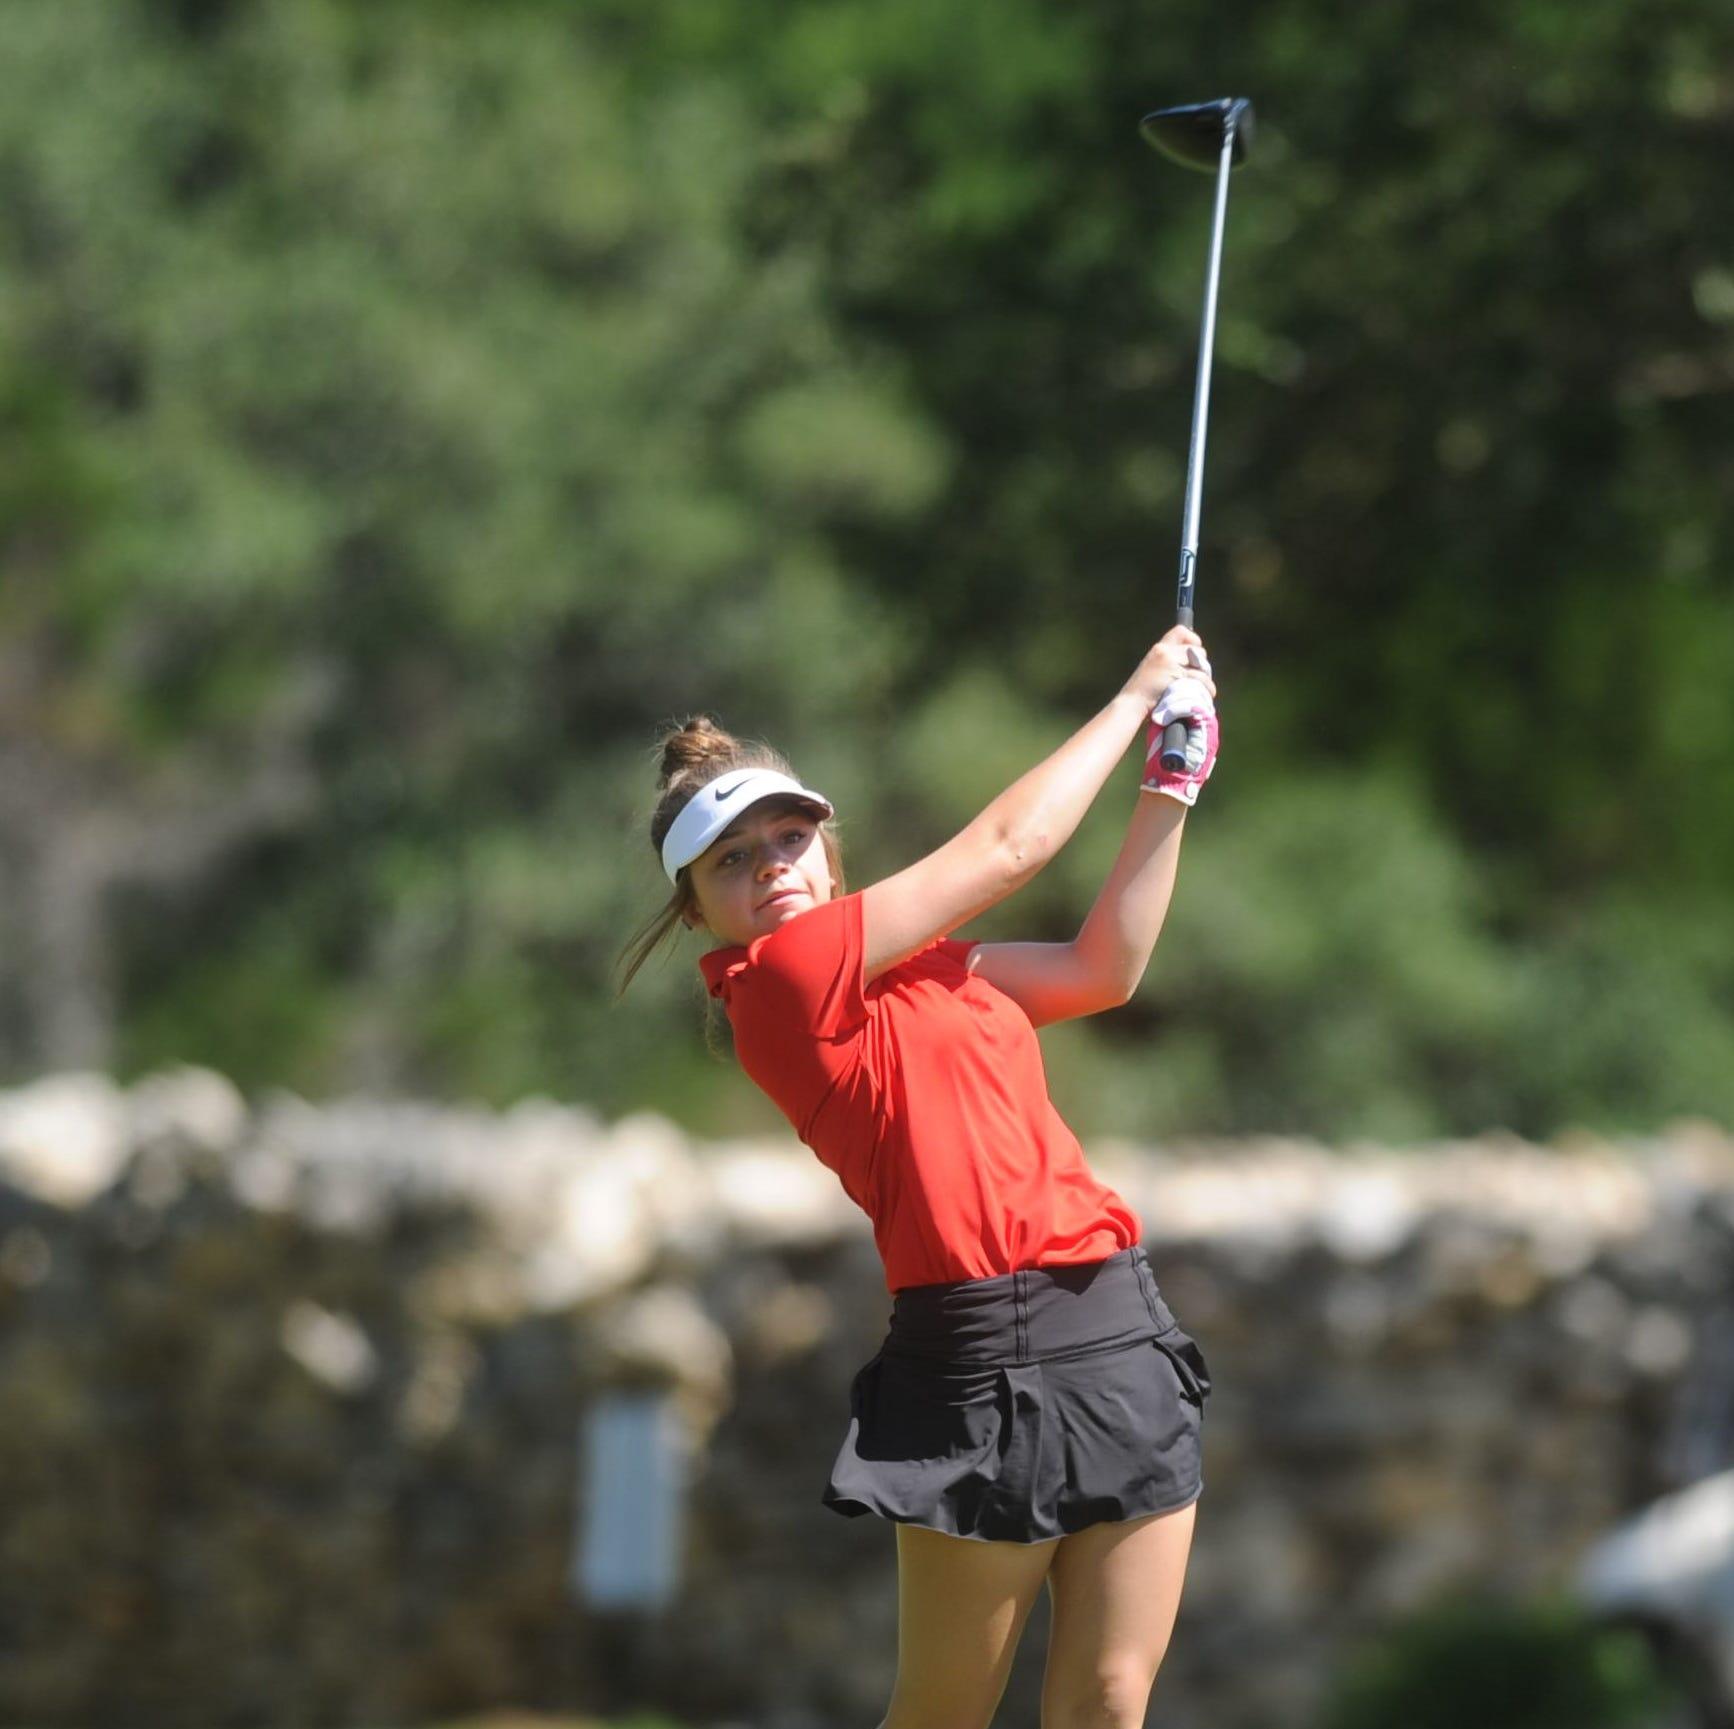 State golf: Olney's Mattie Barrington in 3rd after 1st round; Jacksboro sitting in 4th